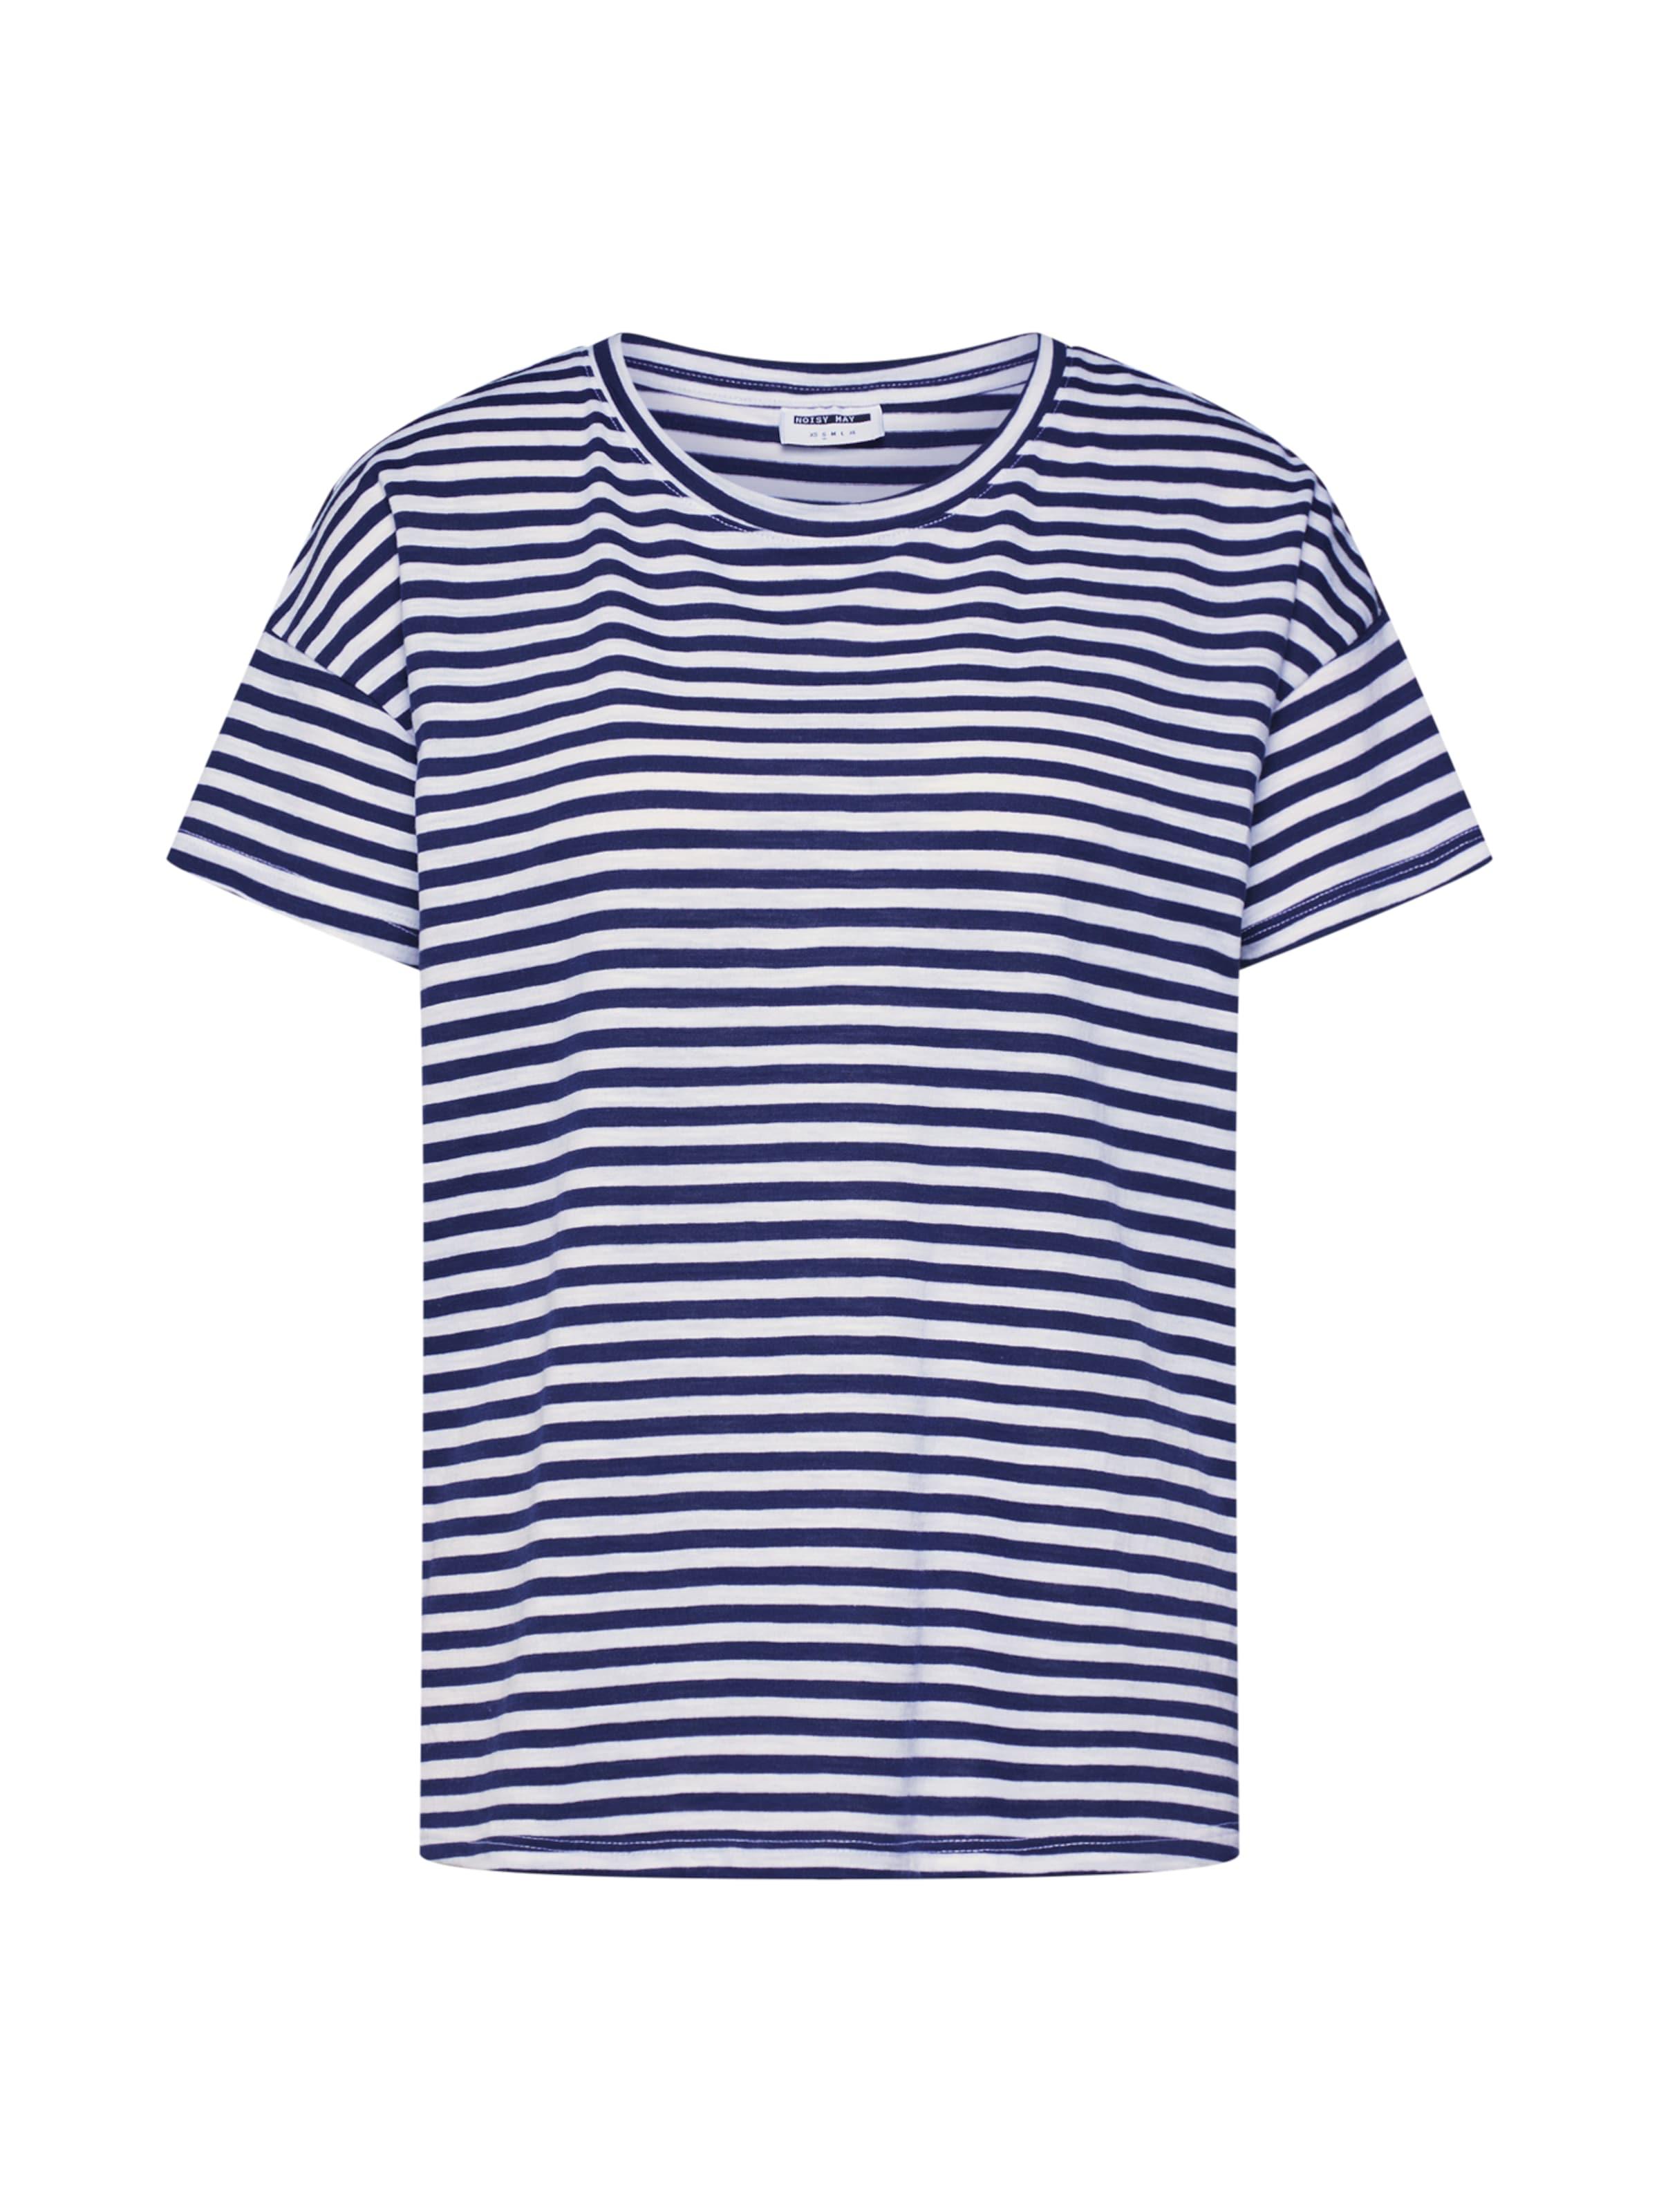 Noisy Shirt BlauWeiß May In 'command' dxtrshQC